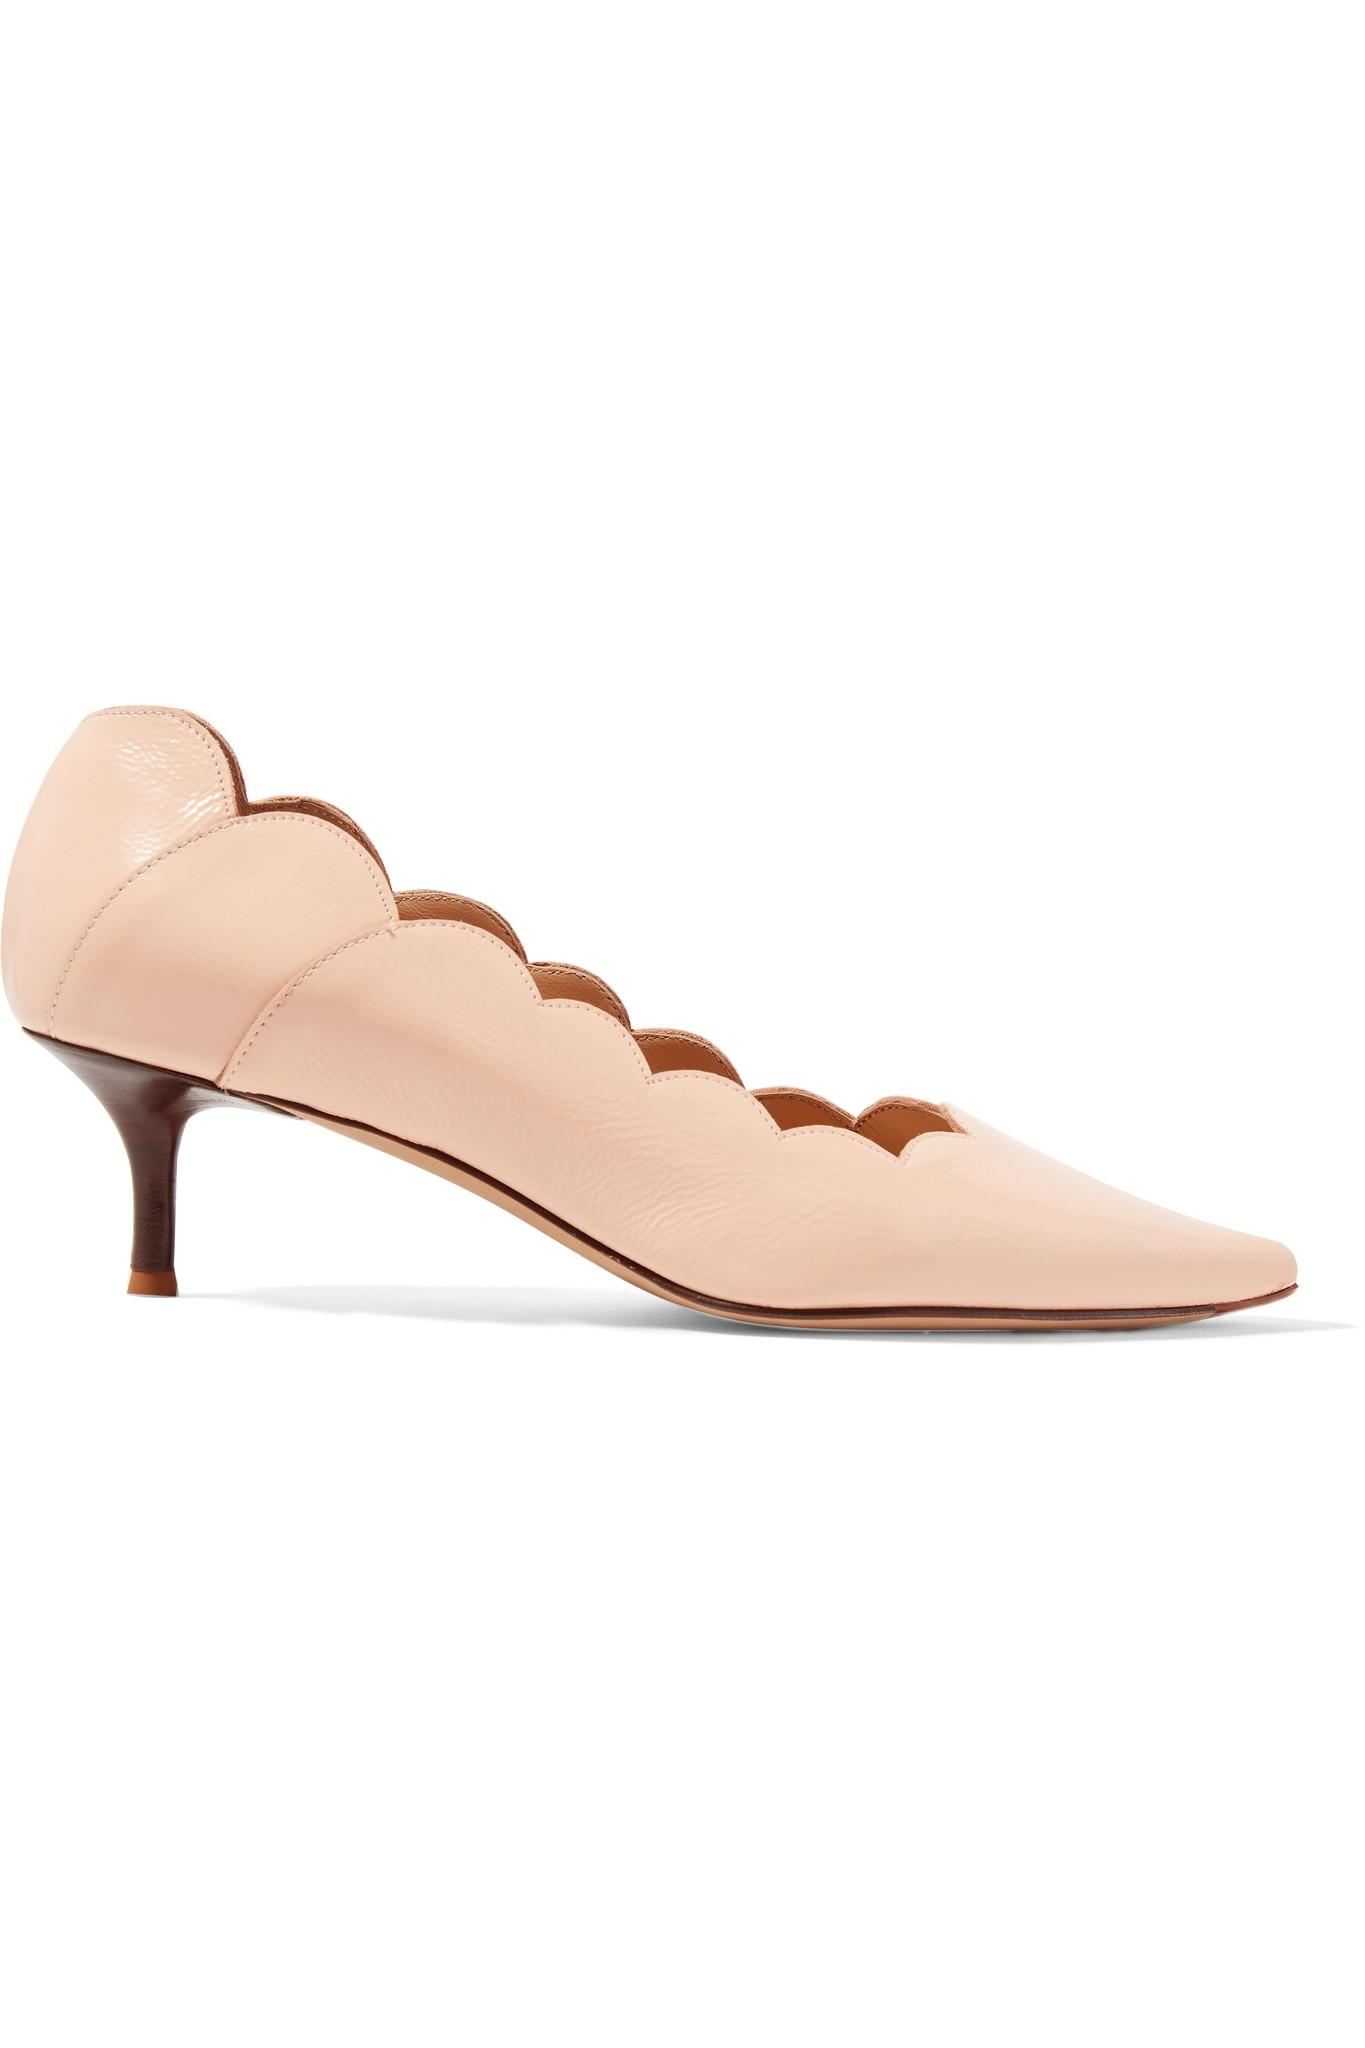 80e9f8607dd2 Chloé. Women s Lauren Scalloped Glossed-leather Pumps